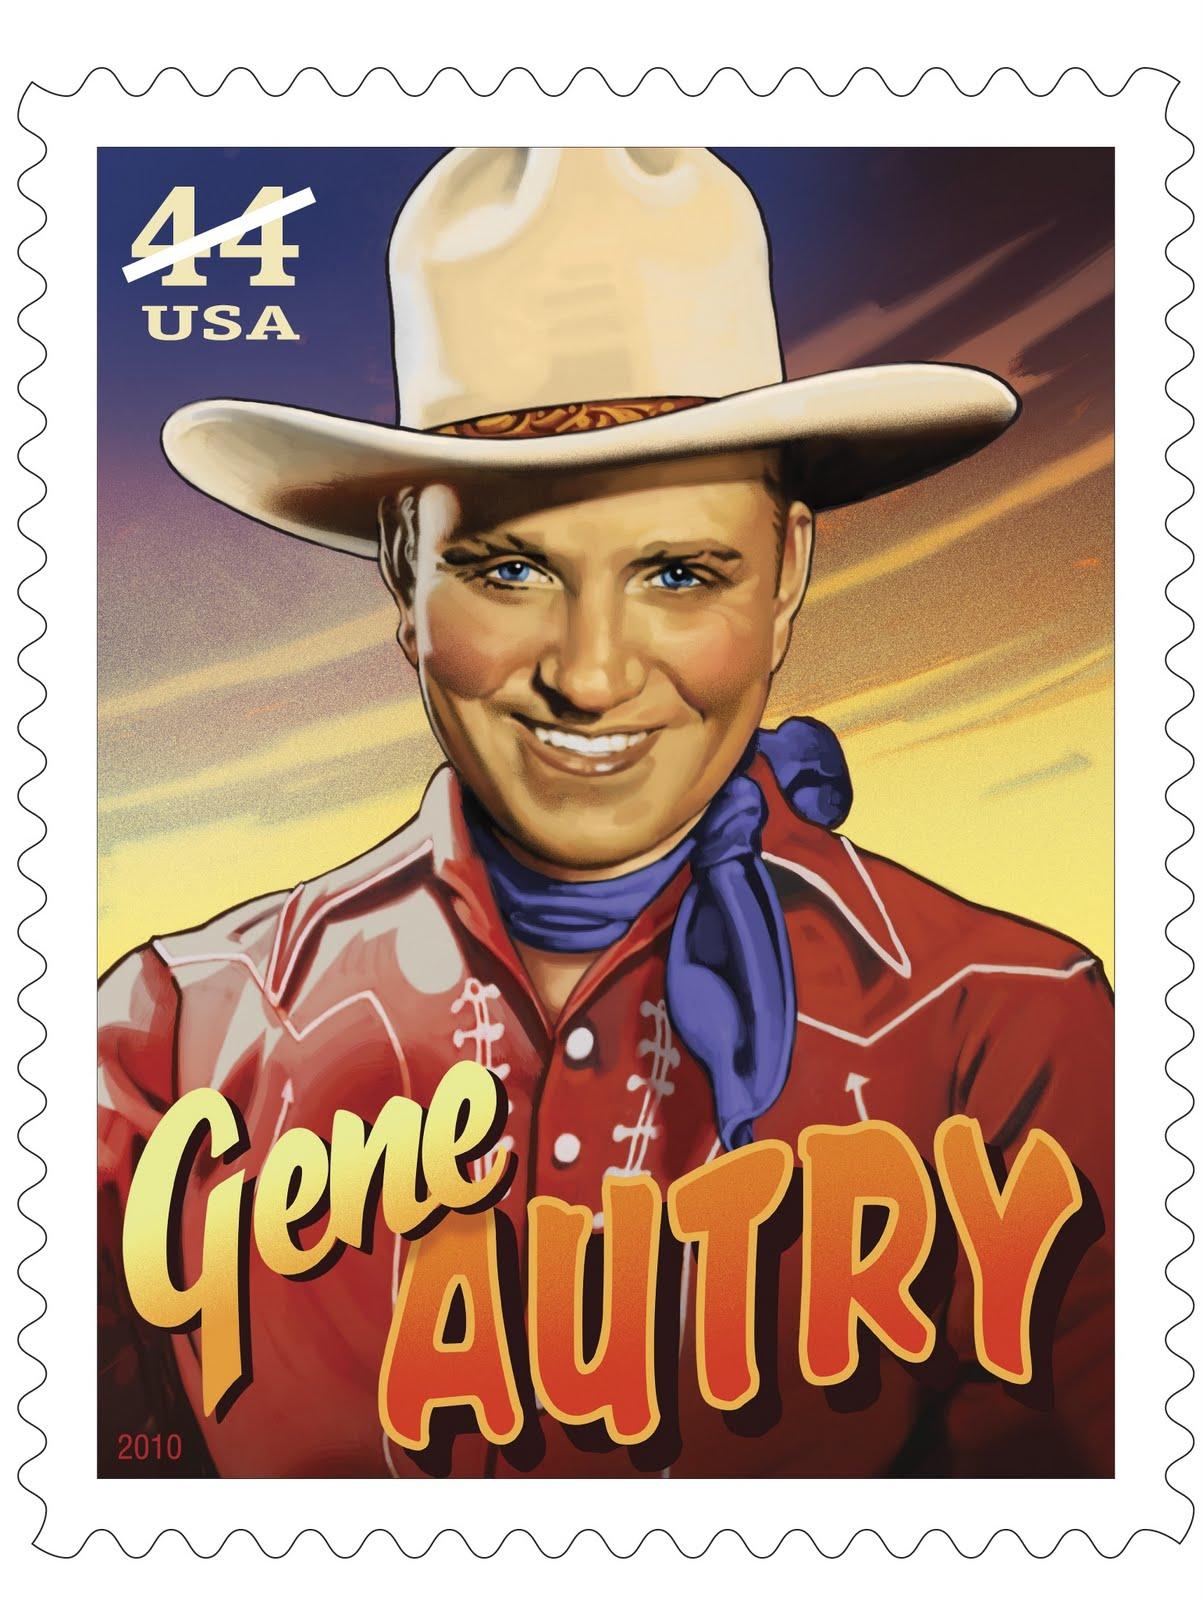 Gene Autry Stamp